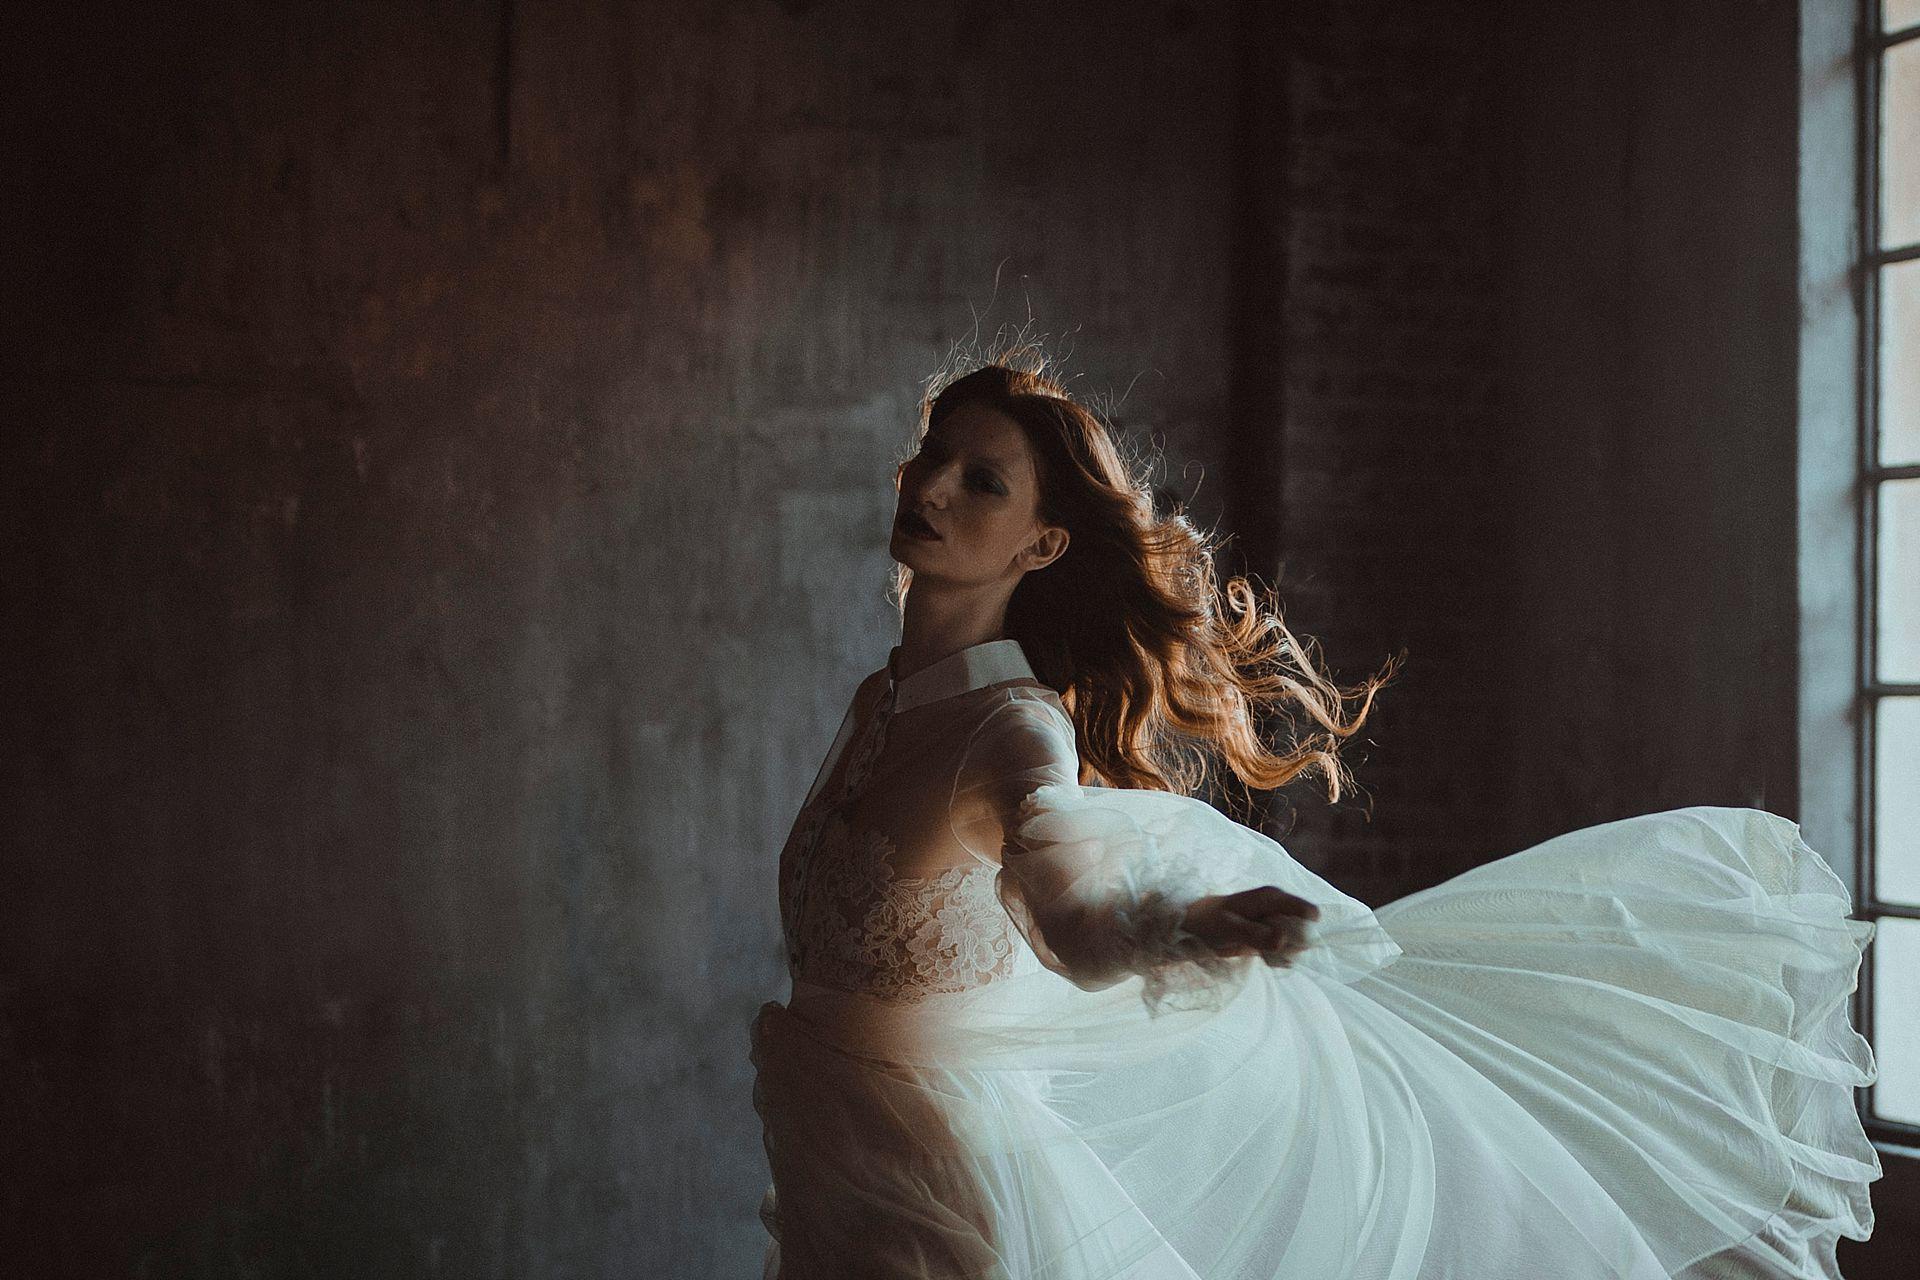 Decadent Wedding Inspiration- Moody Wedding Inspiration- Sudio Fotografico Bacci- Unconventional Wedding- floaty wedding dress- wedding dress model